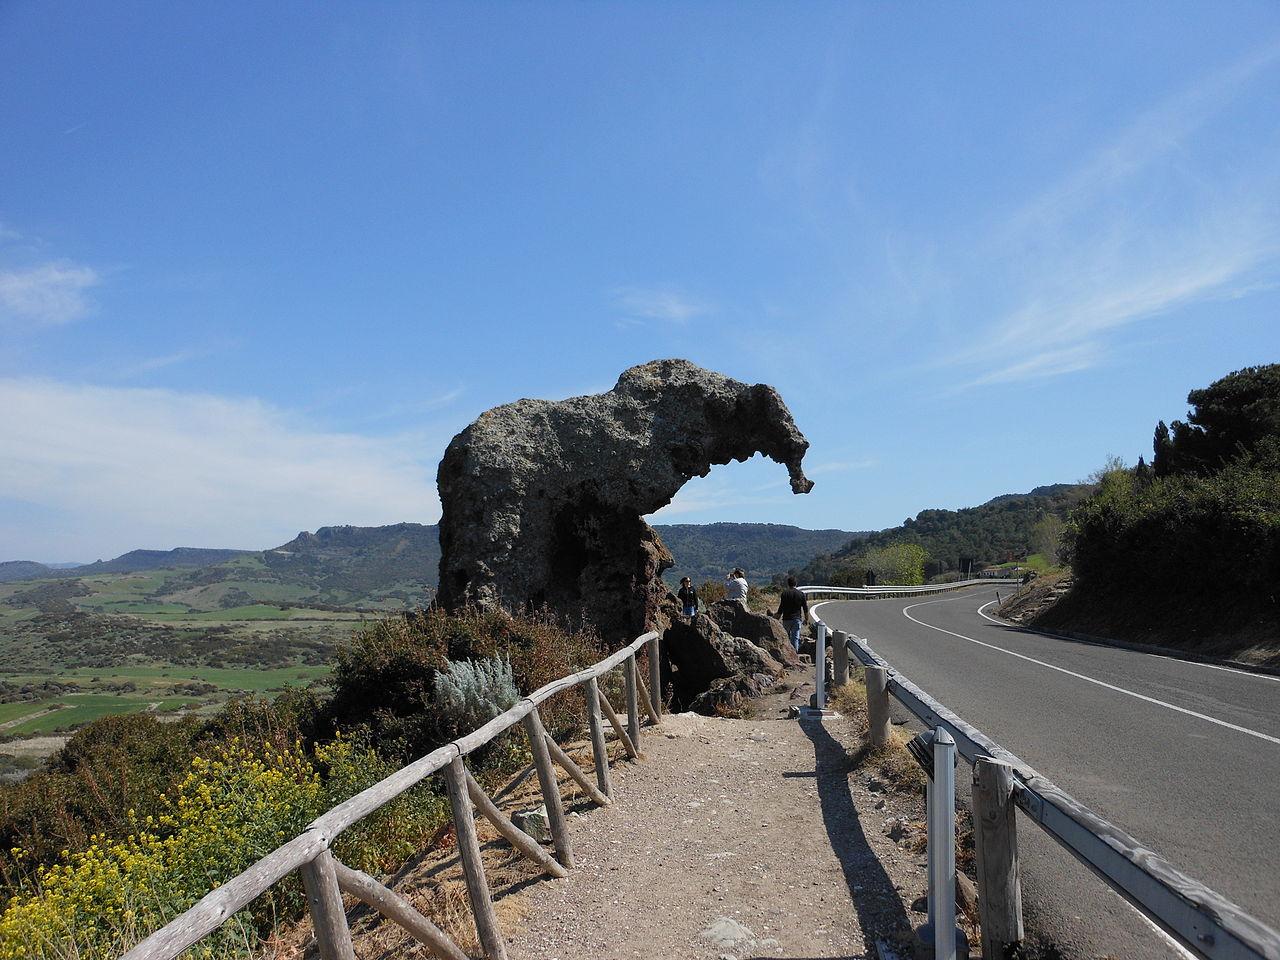 1280px-Castelsardo_-_Roccia_dell'Elefante_(01)